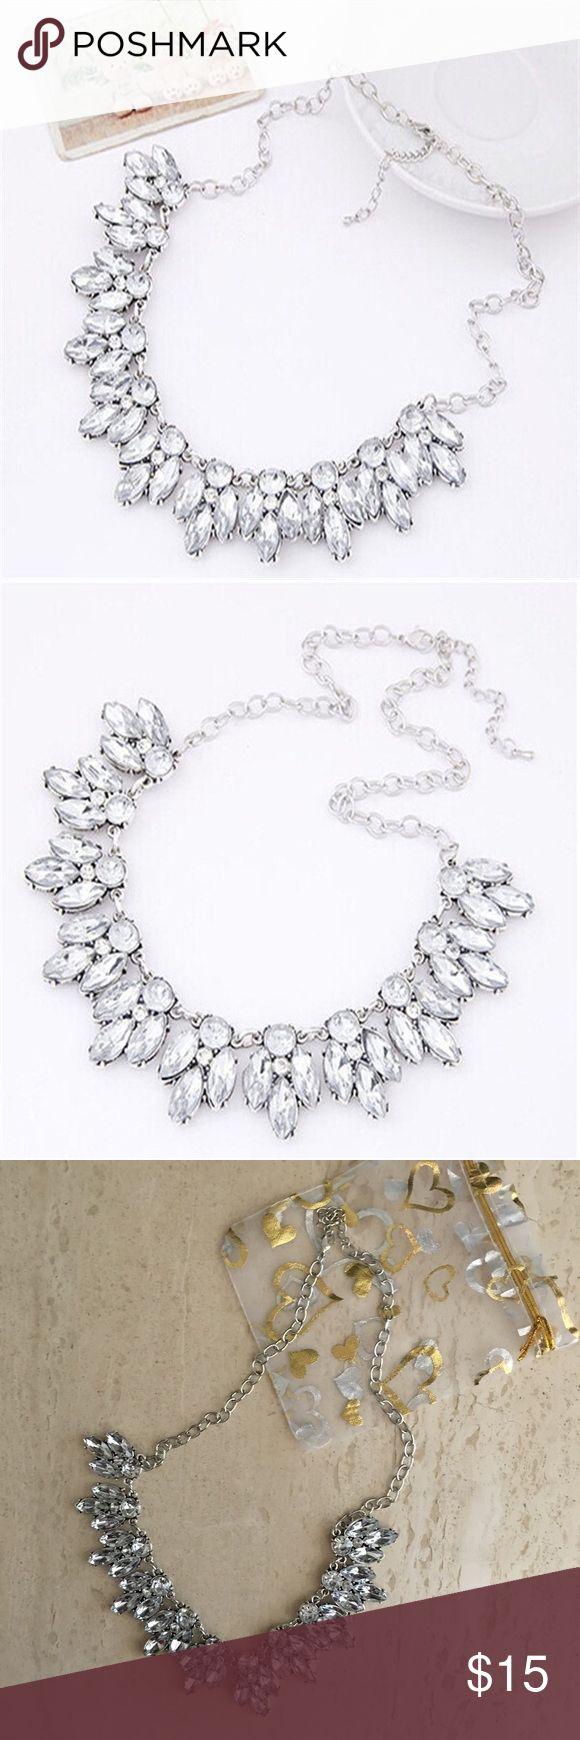 Rhinestone statement necklace Silver crystal statement necklace. Adjustable length. Jewelry Necklaces